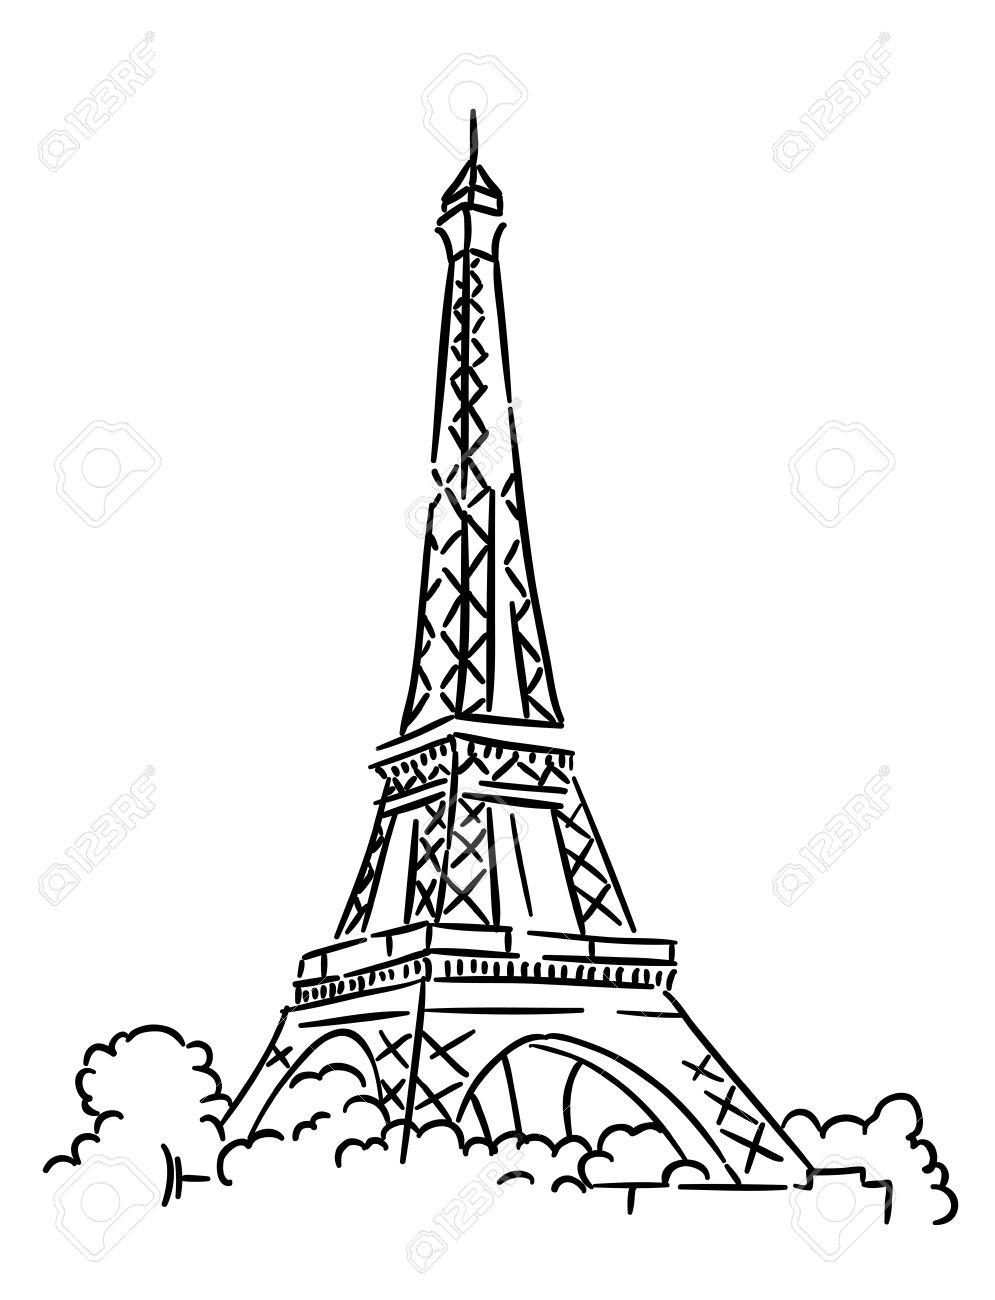 995x1300 Eiffel Tower In Paris, France. Sketch Vector Illustration Royalty